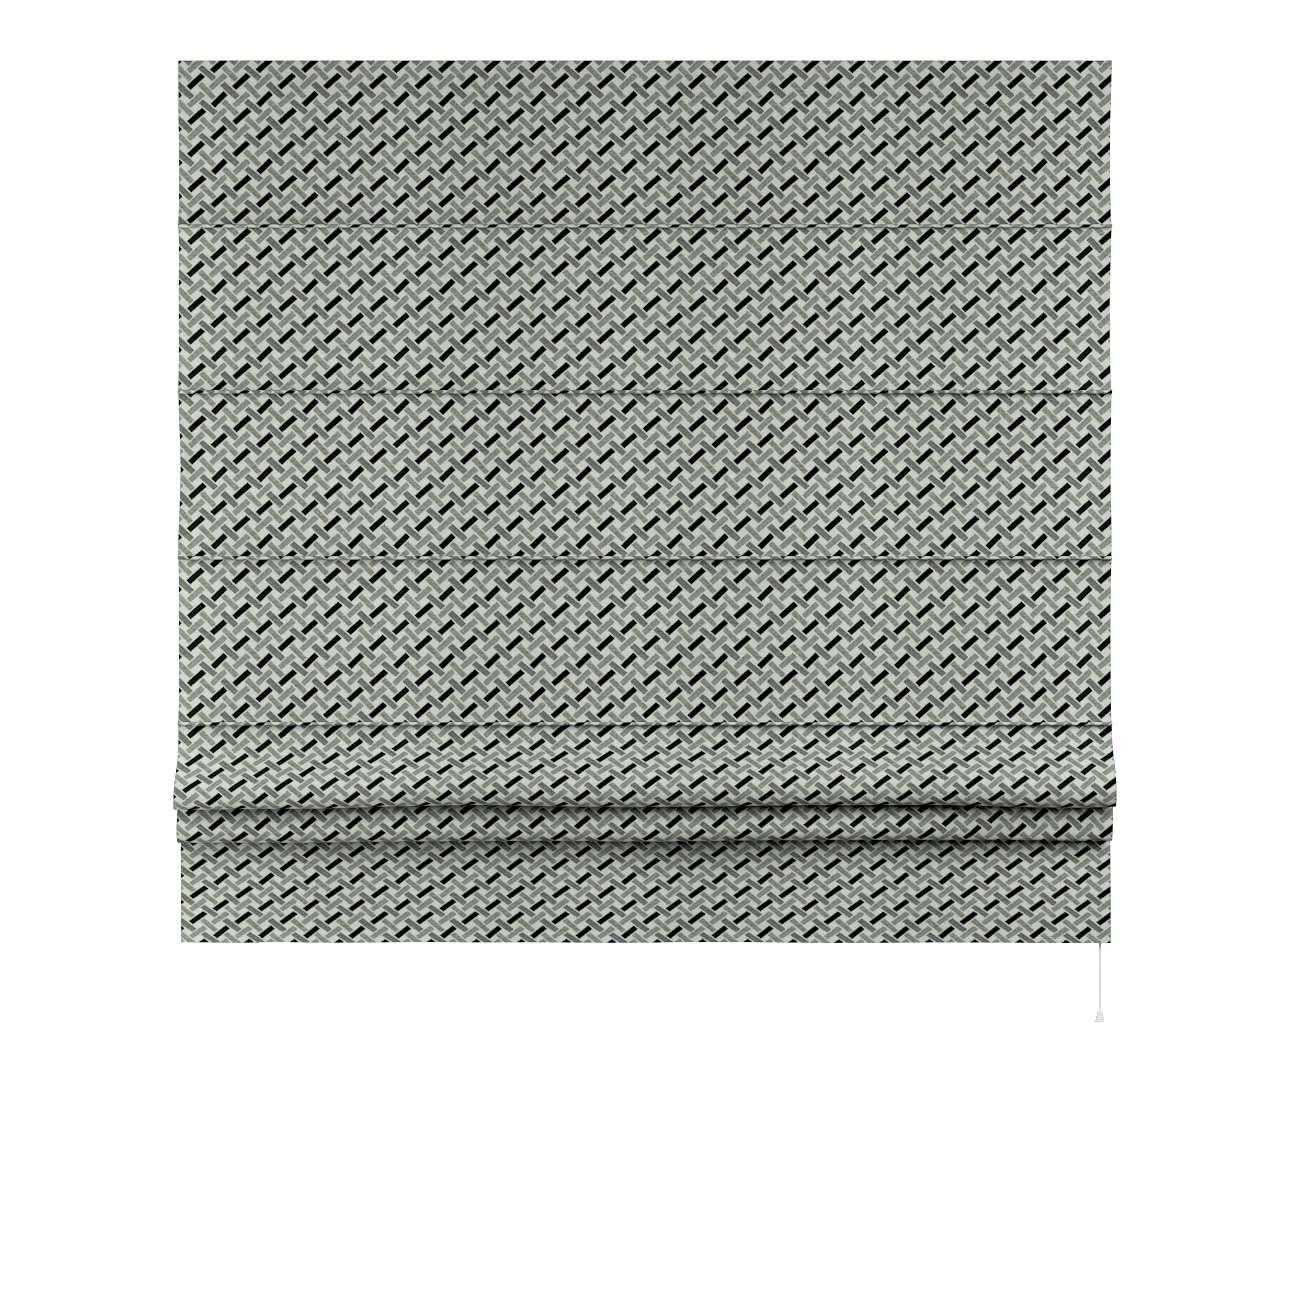 Vouwgordijn Padva van de collectie Black & White, Stof: 142-78